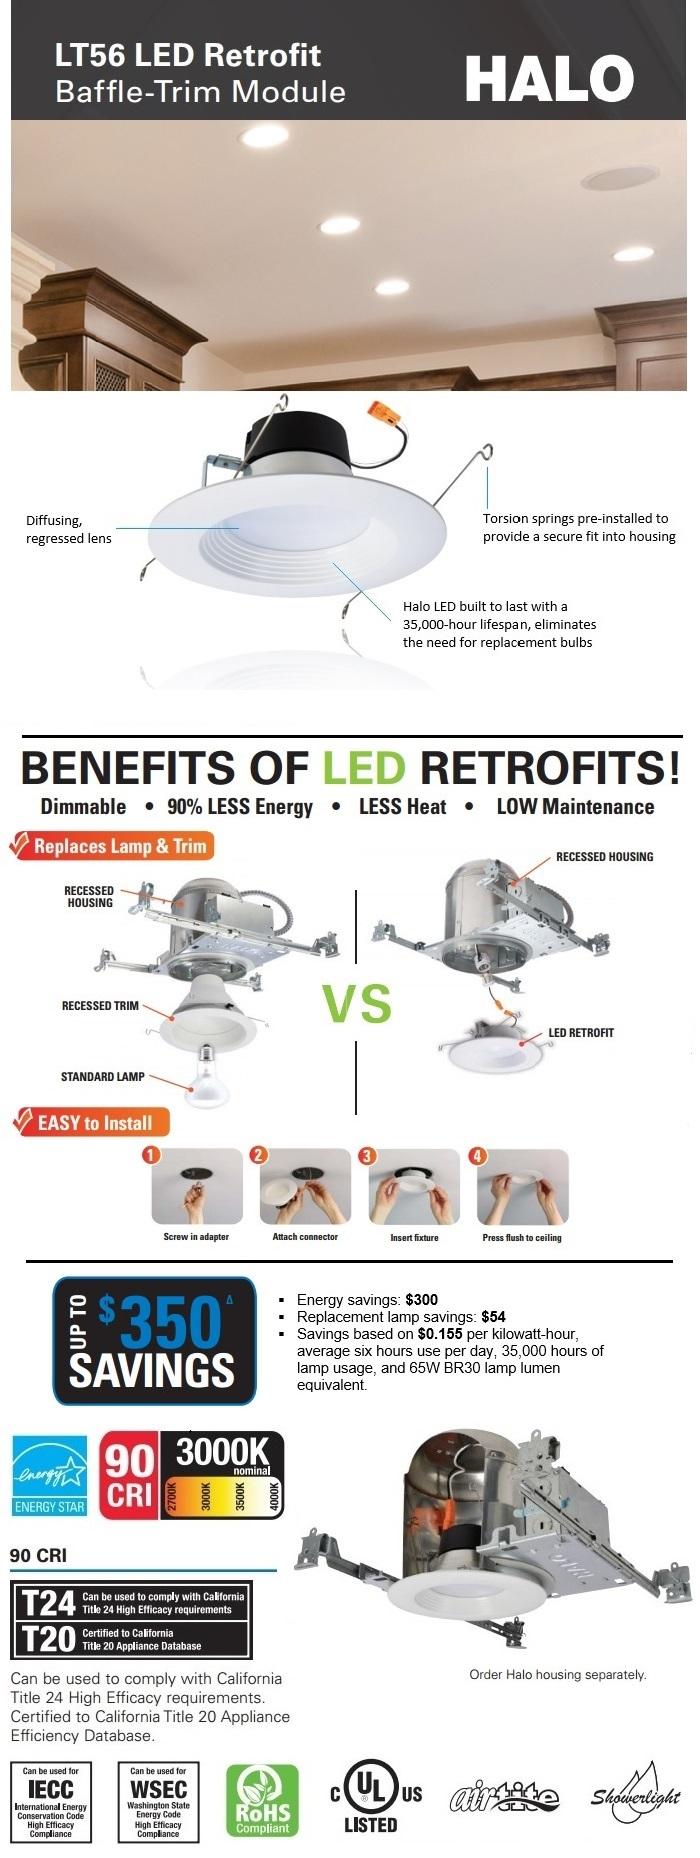 Home Depot Recessed Light Adapter